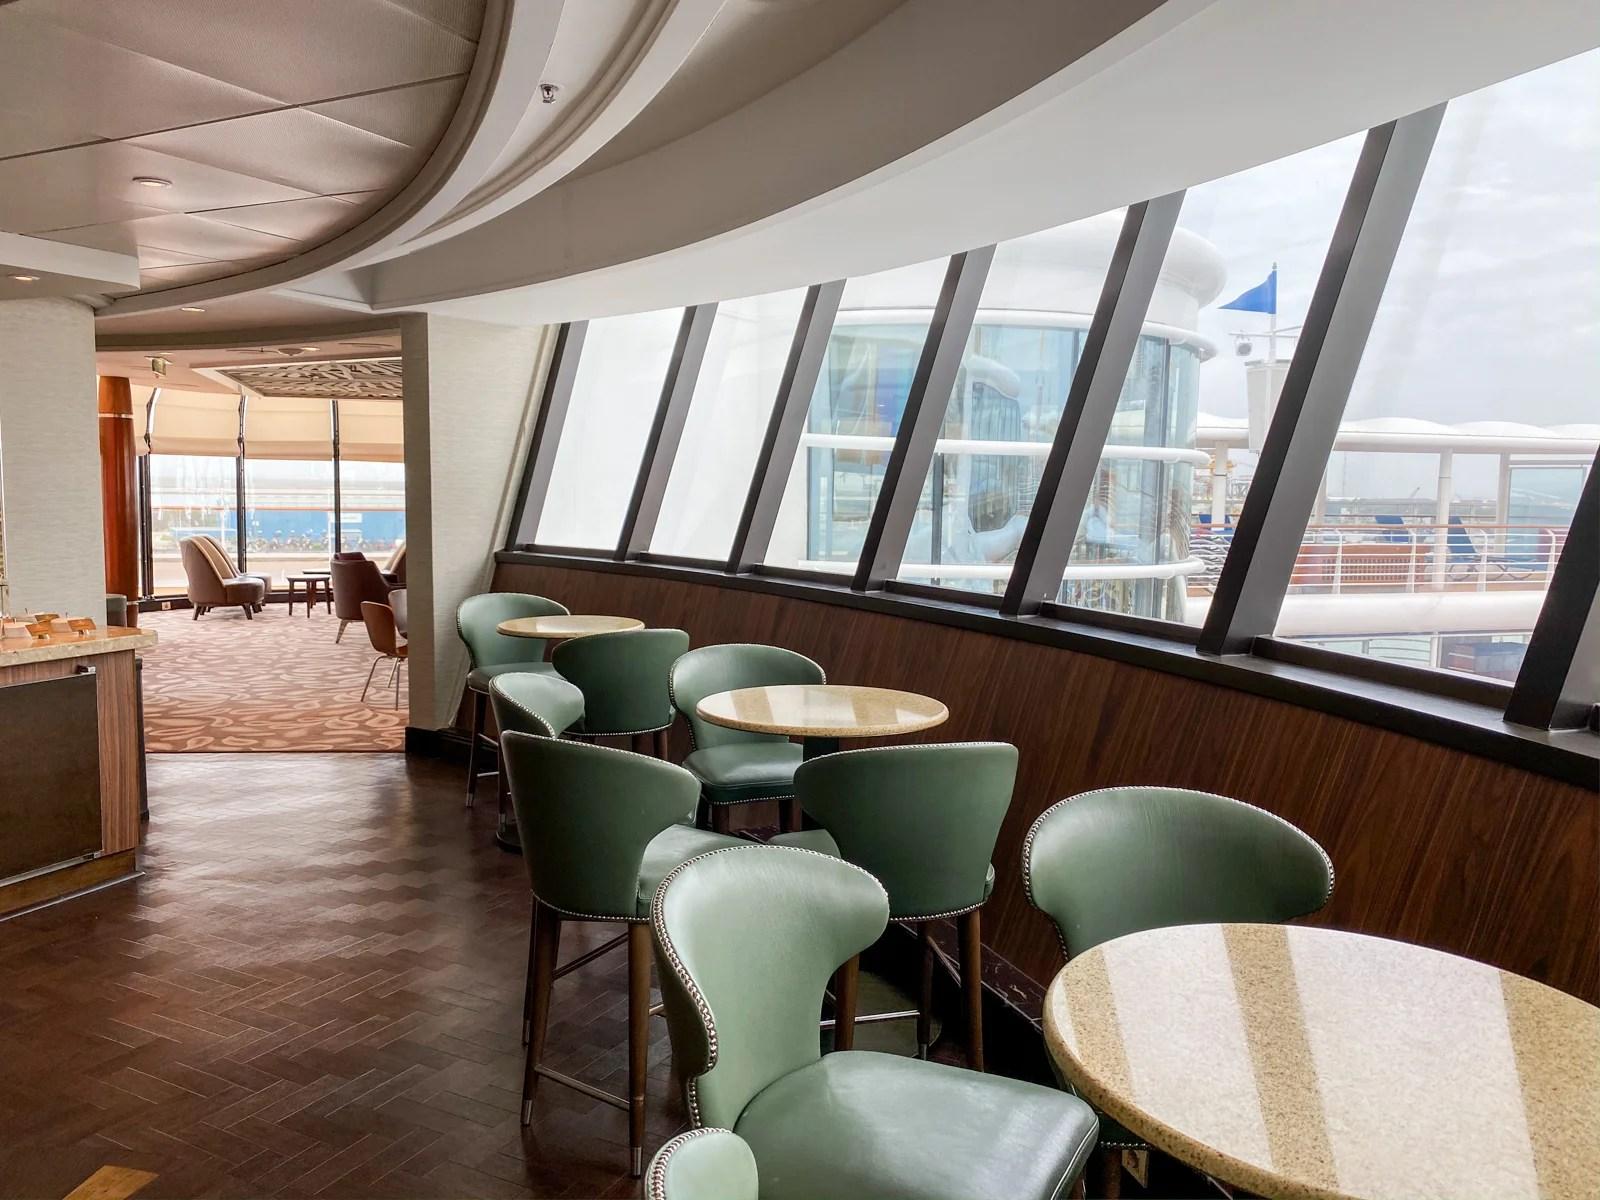 Is Disney Cruise Line concierge level worth it?